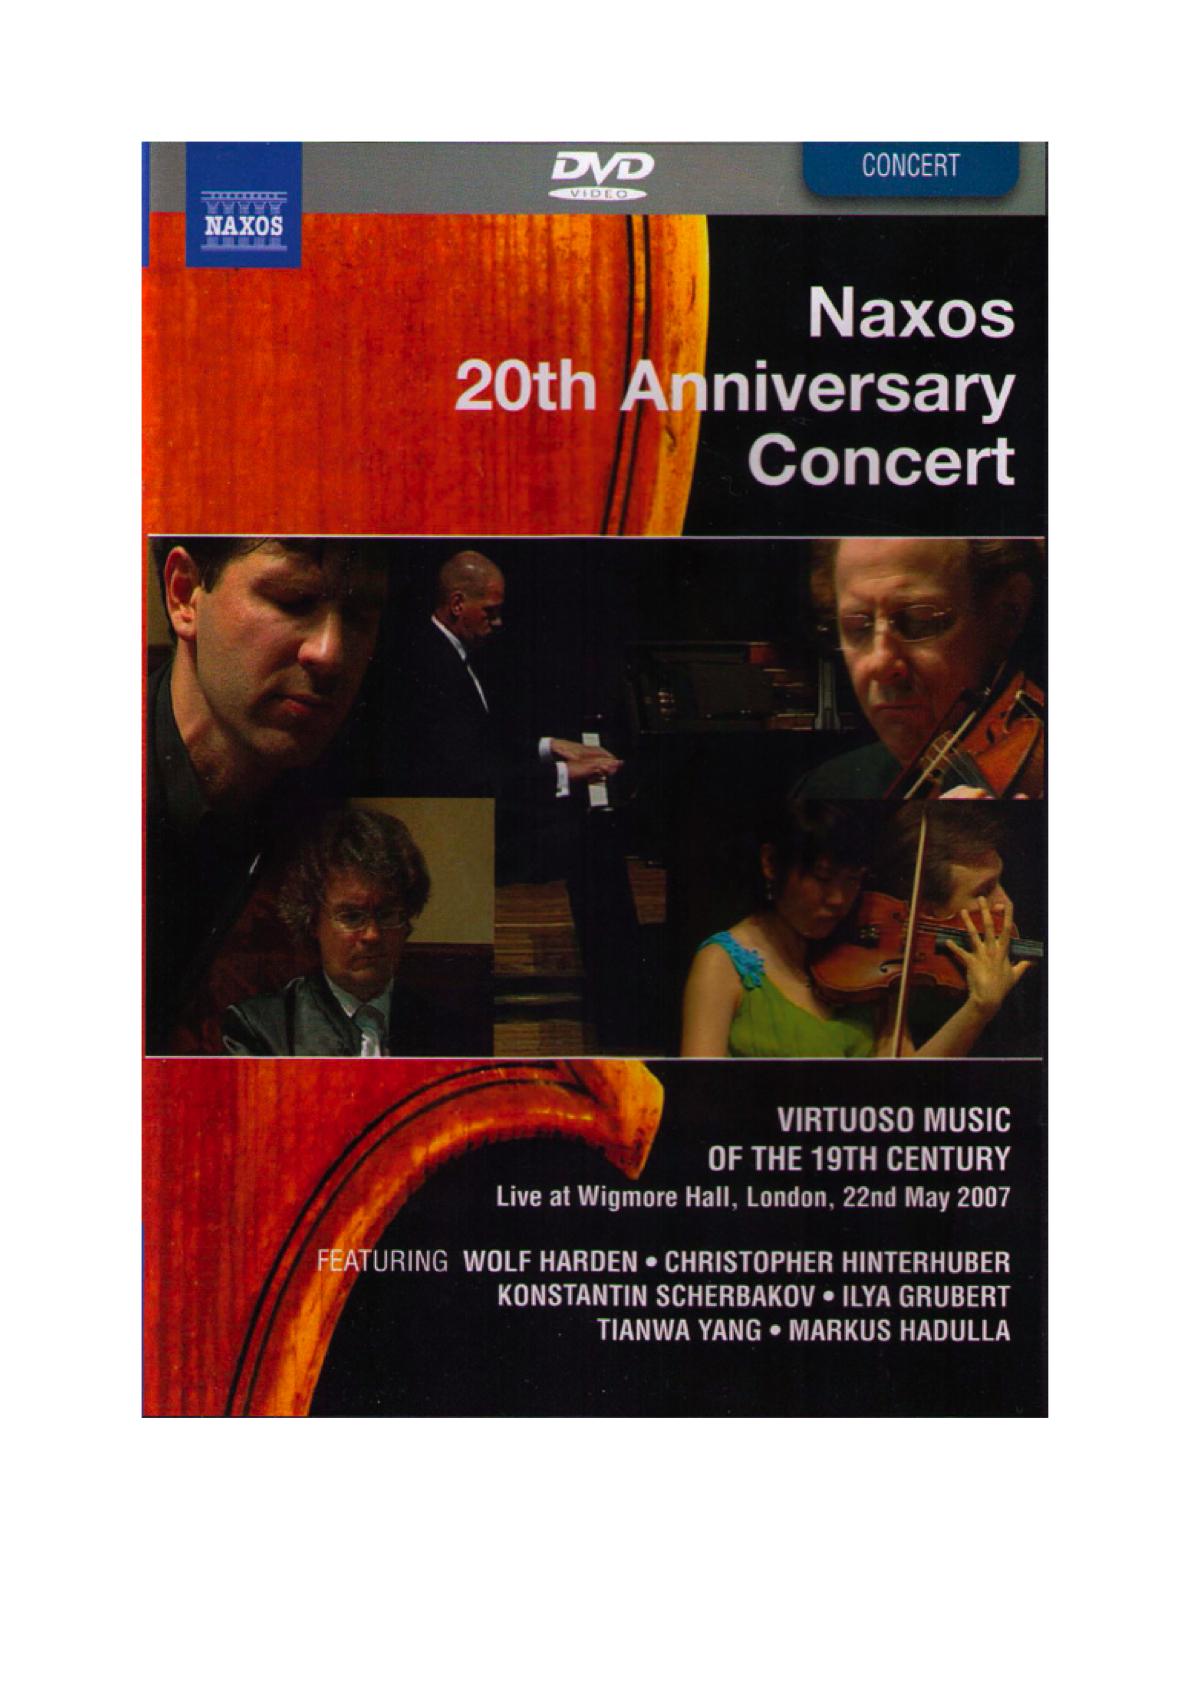 Naxos 20th Anniversary Concert DVD   with Tianwa Yang, Violine and Markus Hadulla, Klavier